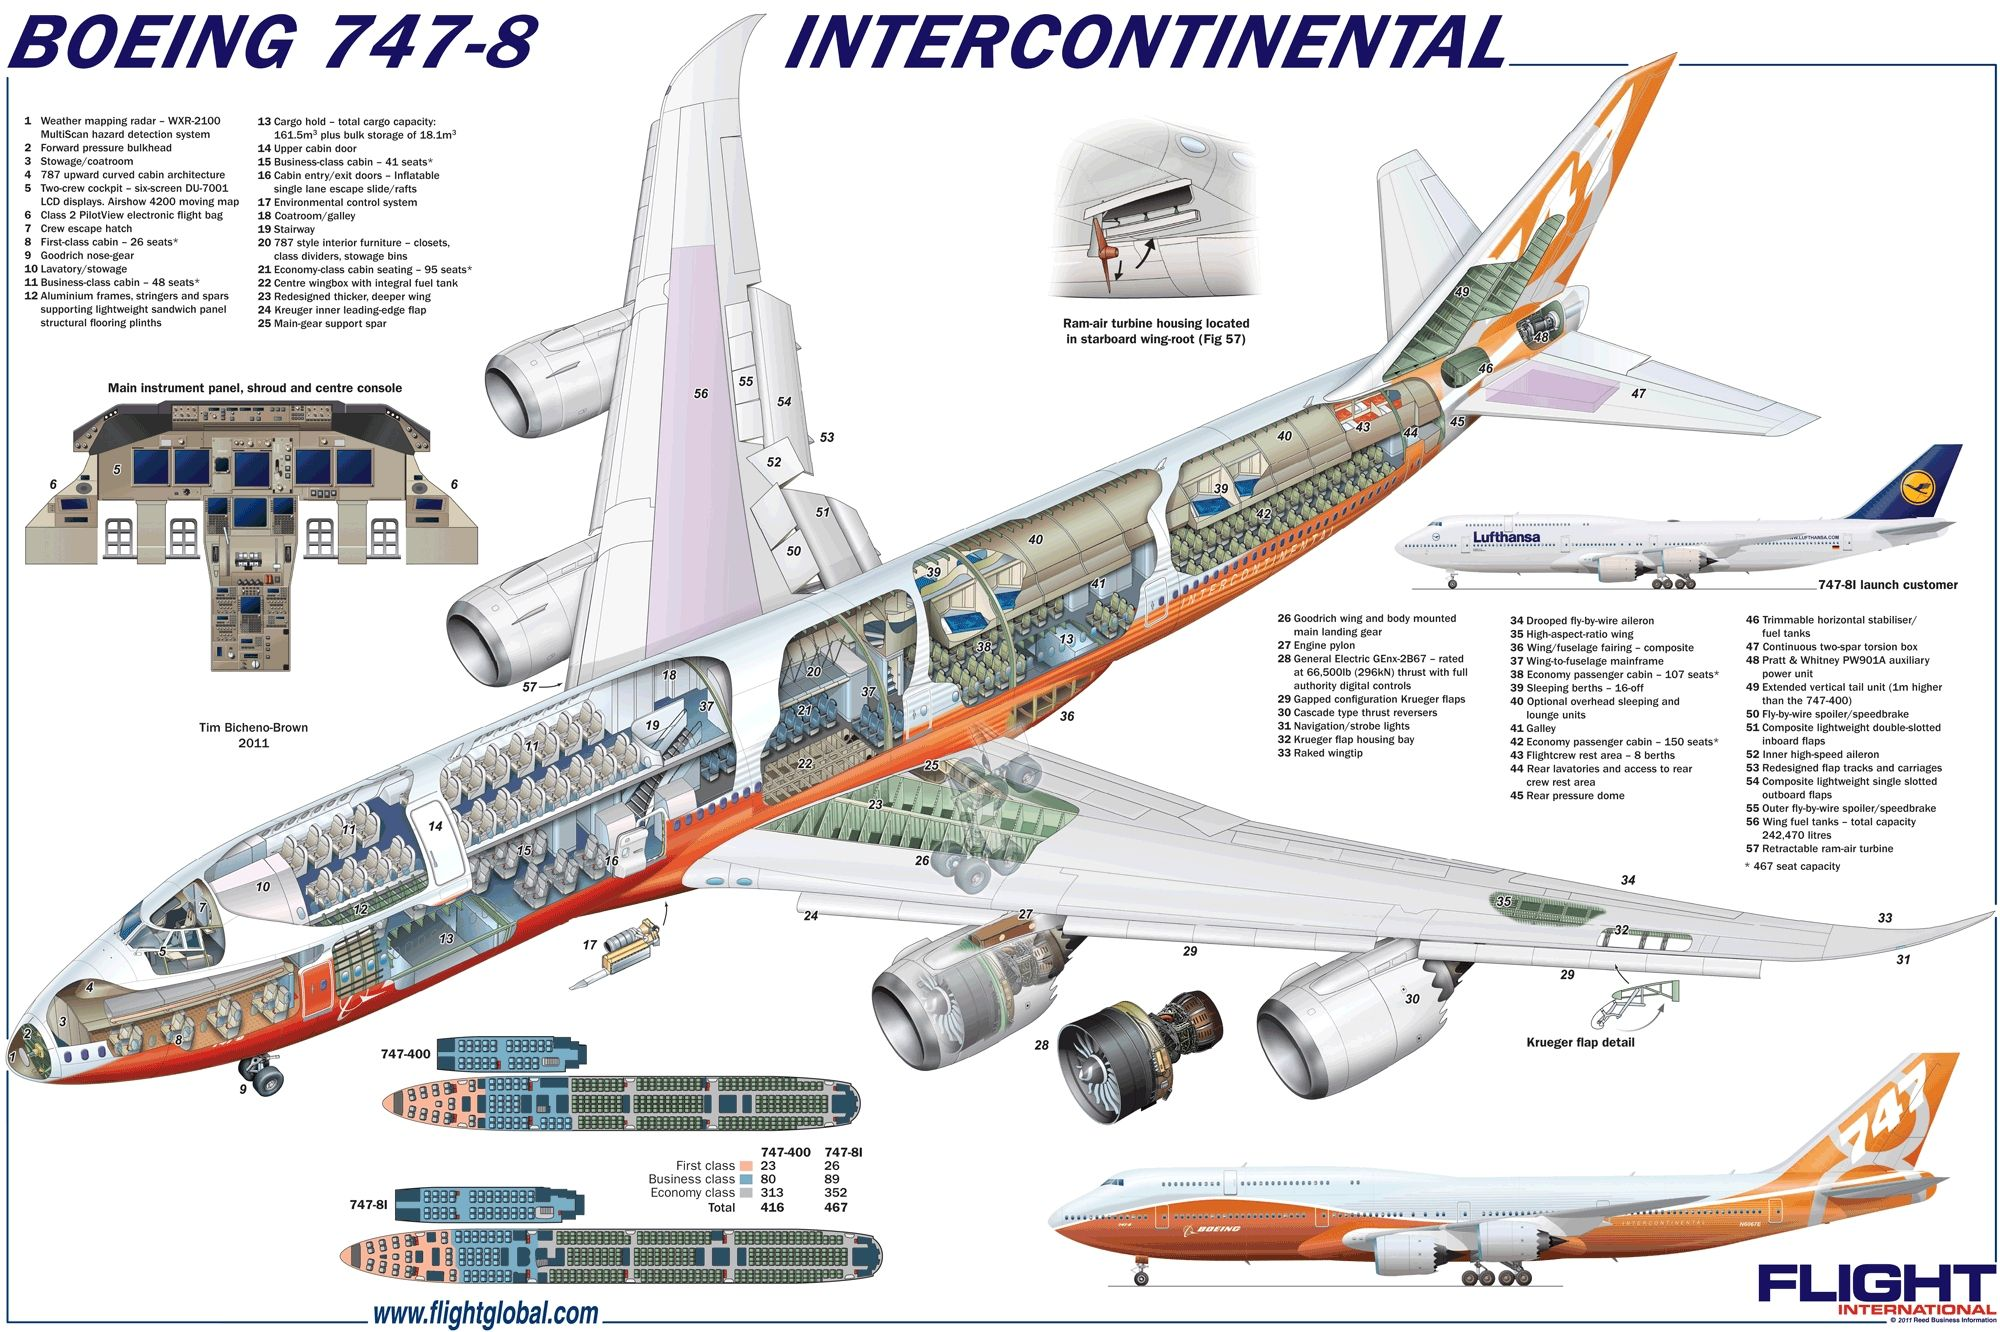 hight resolution of boeing 747 8 intercontinental cutaway diagram